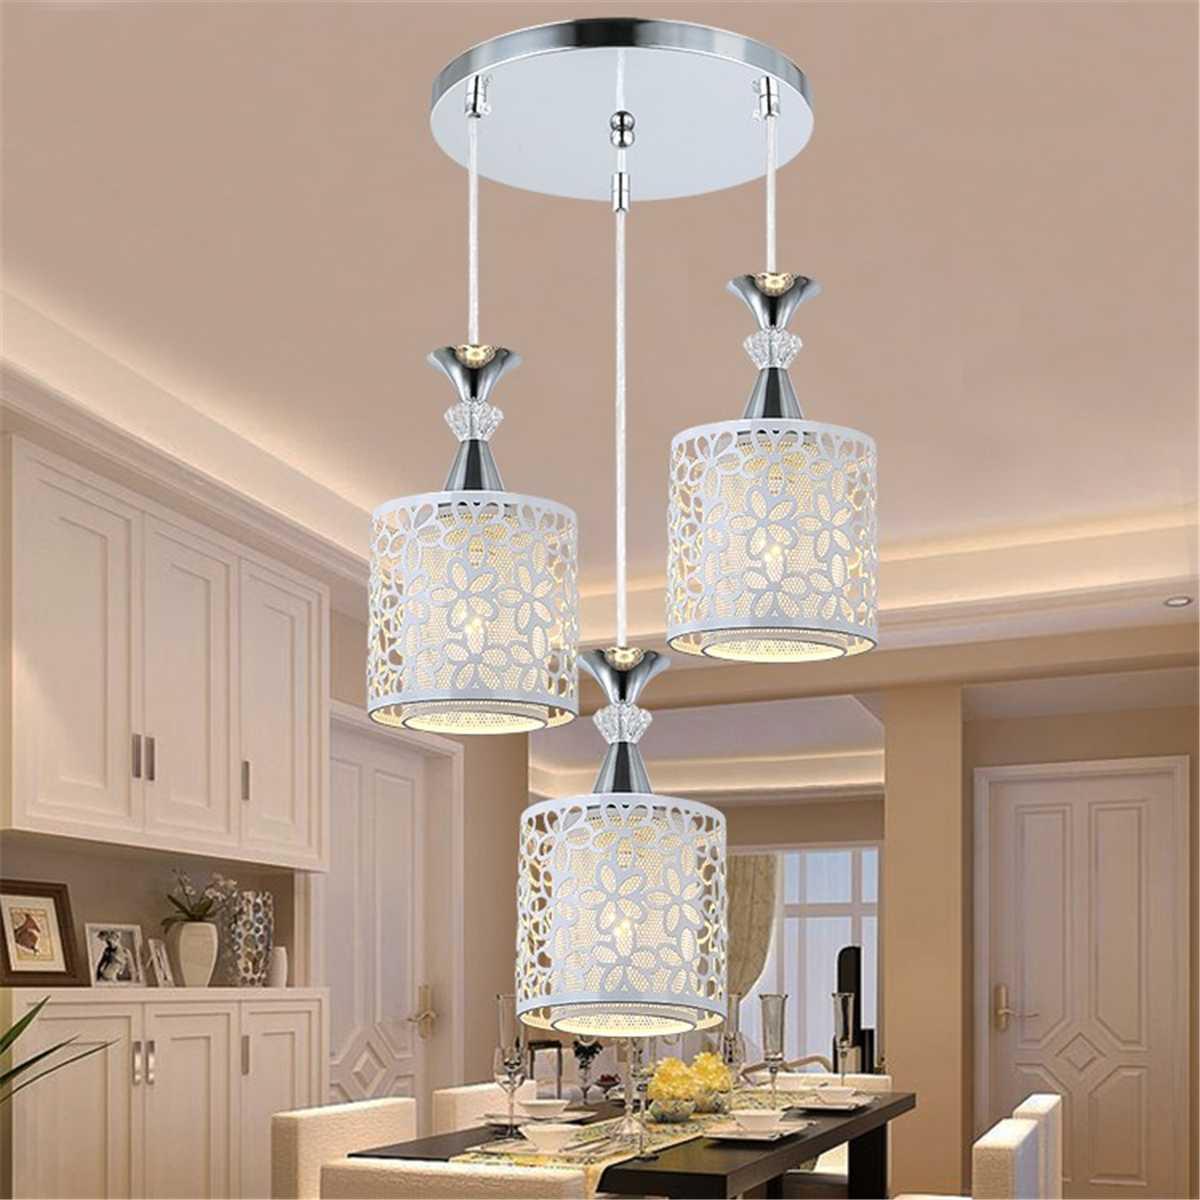 Lámparas LED de techo hechas cristal modernas para sala de estar y ...